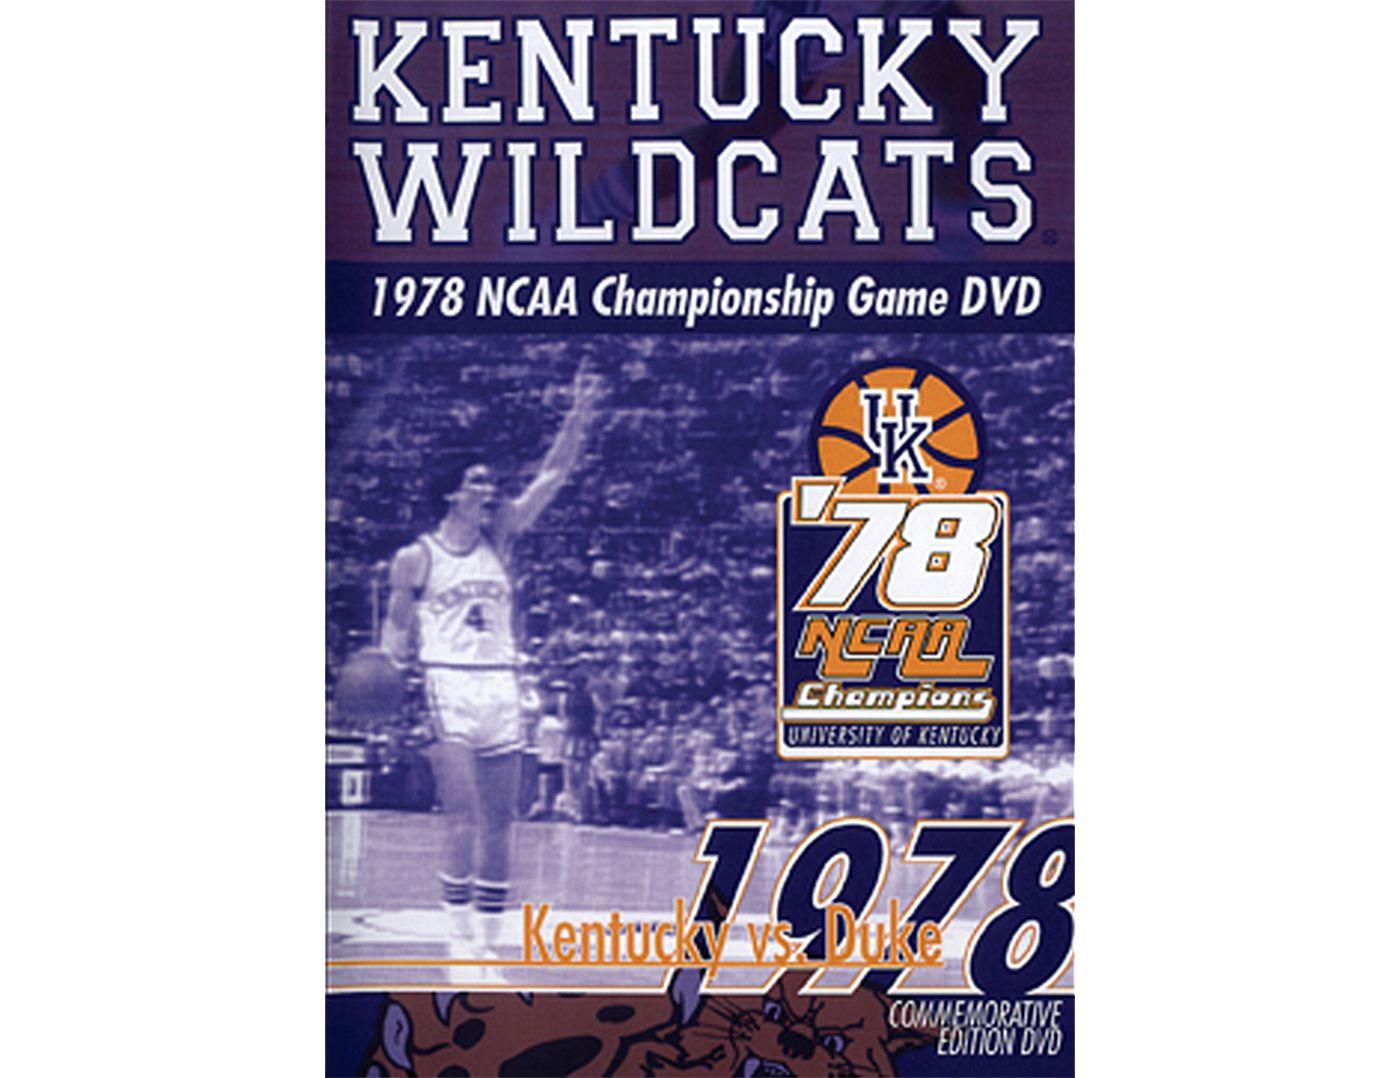 1978 NCAA Men's Basketball National Championship Game: Kentucky Wildcats vs. Duke Blue Devils